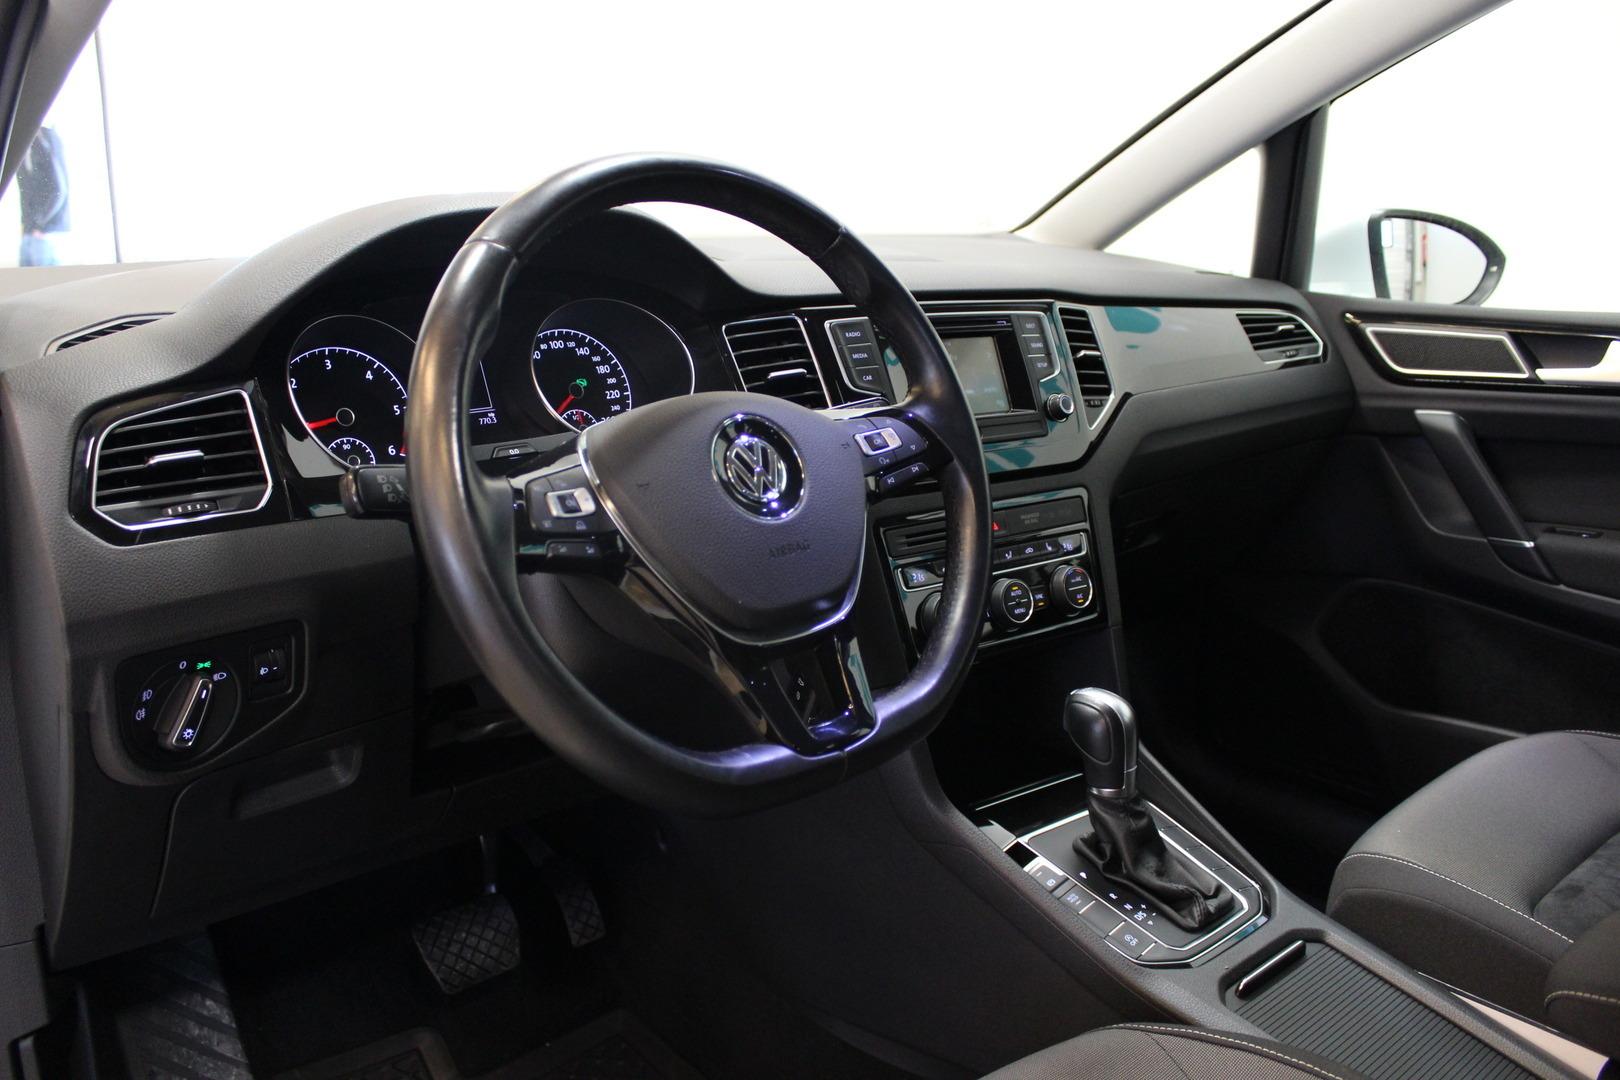 Volkswagen Golf Sportsvan, 2,0 TDI 110 kW (150 hv) Highline DSG #Huippusiisti #1-omisteinen #Webasto